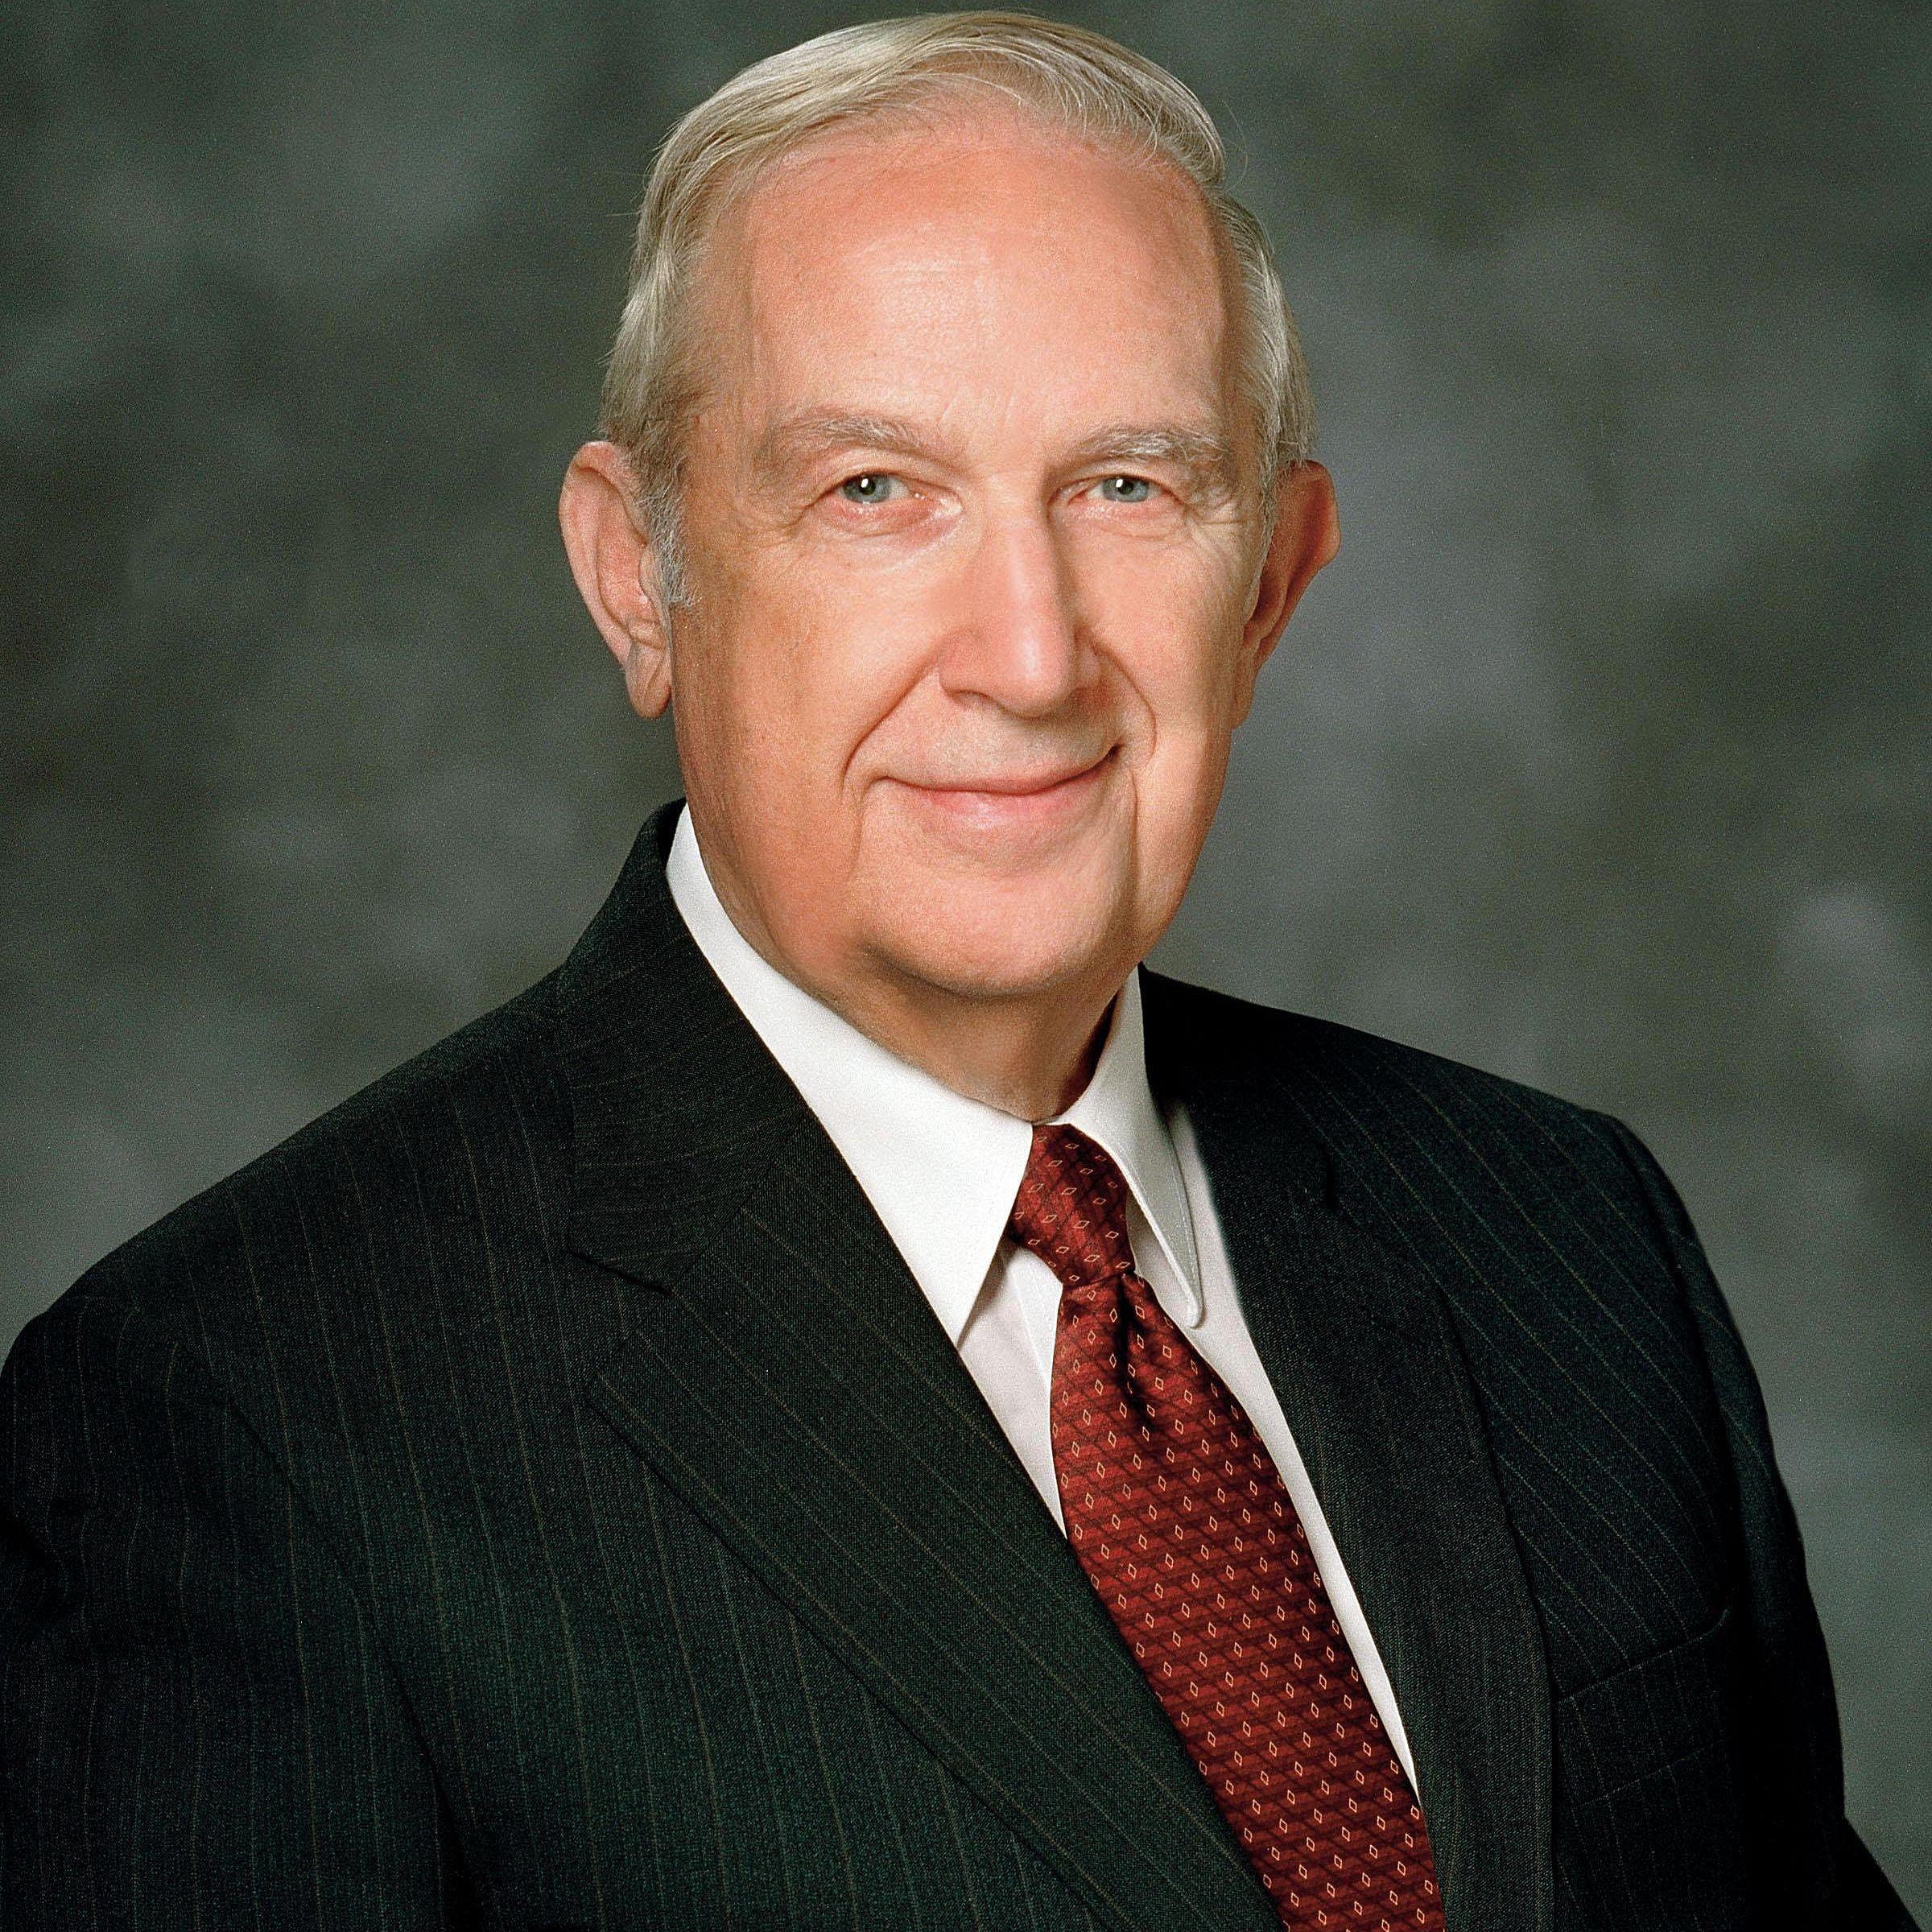 Elder Richard G. Scott, Quorum of the Twelve Apostles.